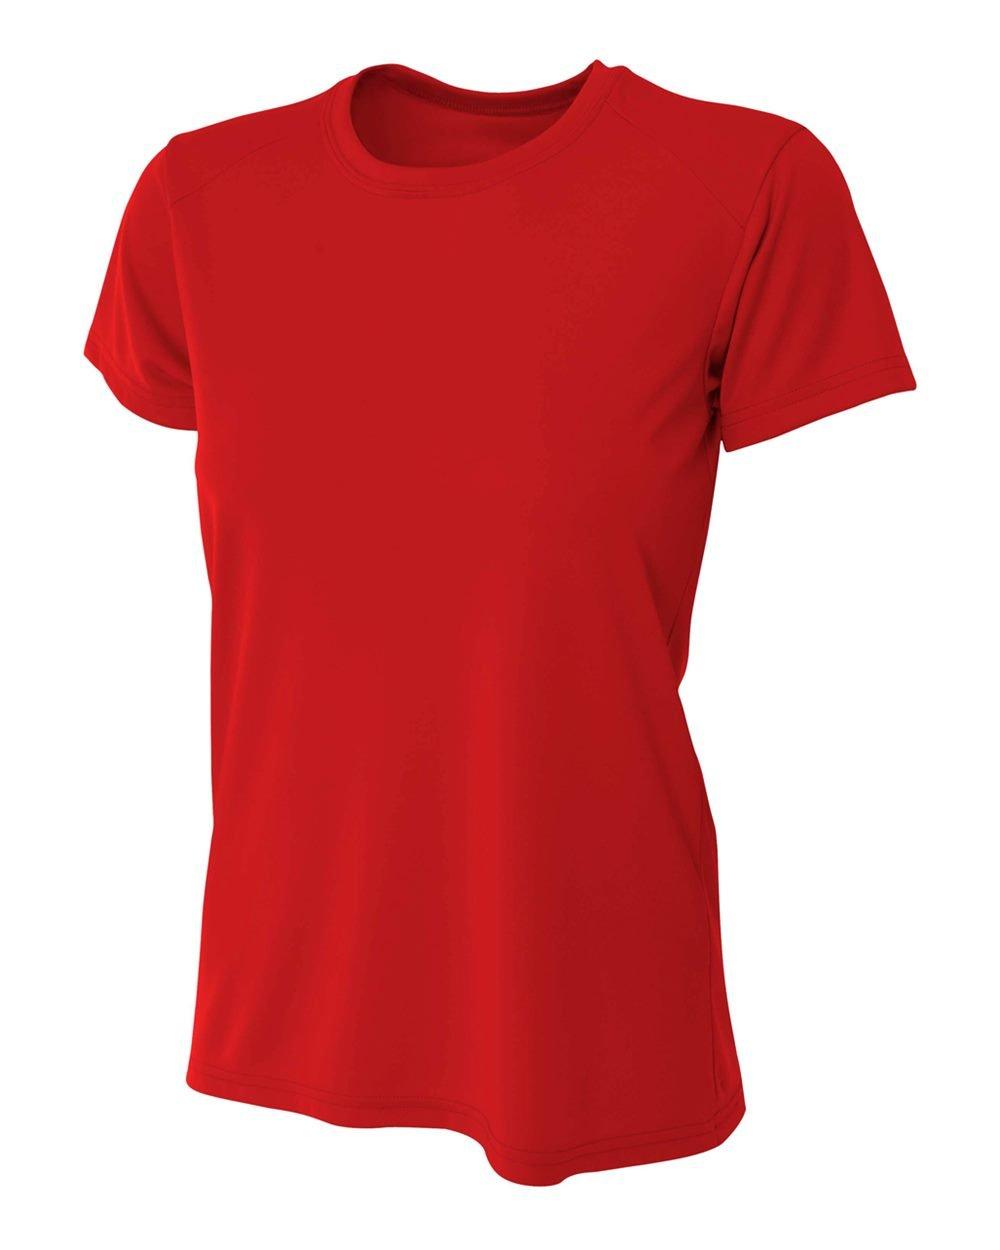 a4冷却Moisture Wickingパフォーマンスインターロックシャツ B004QRZSXW XL|X-large,scarlet Red X-large,scarlet Red XL